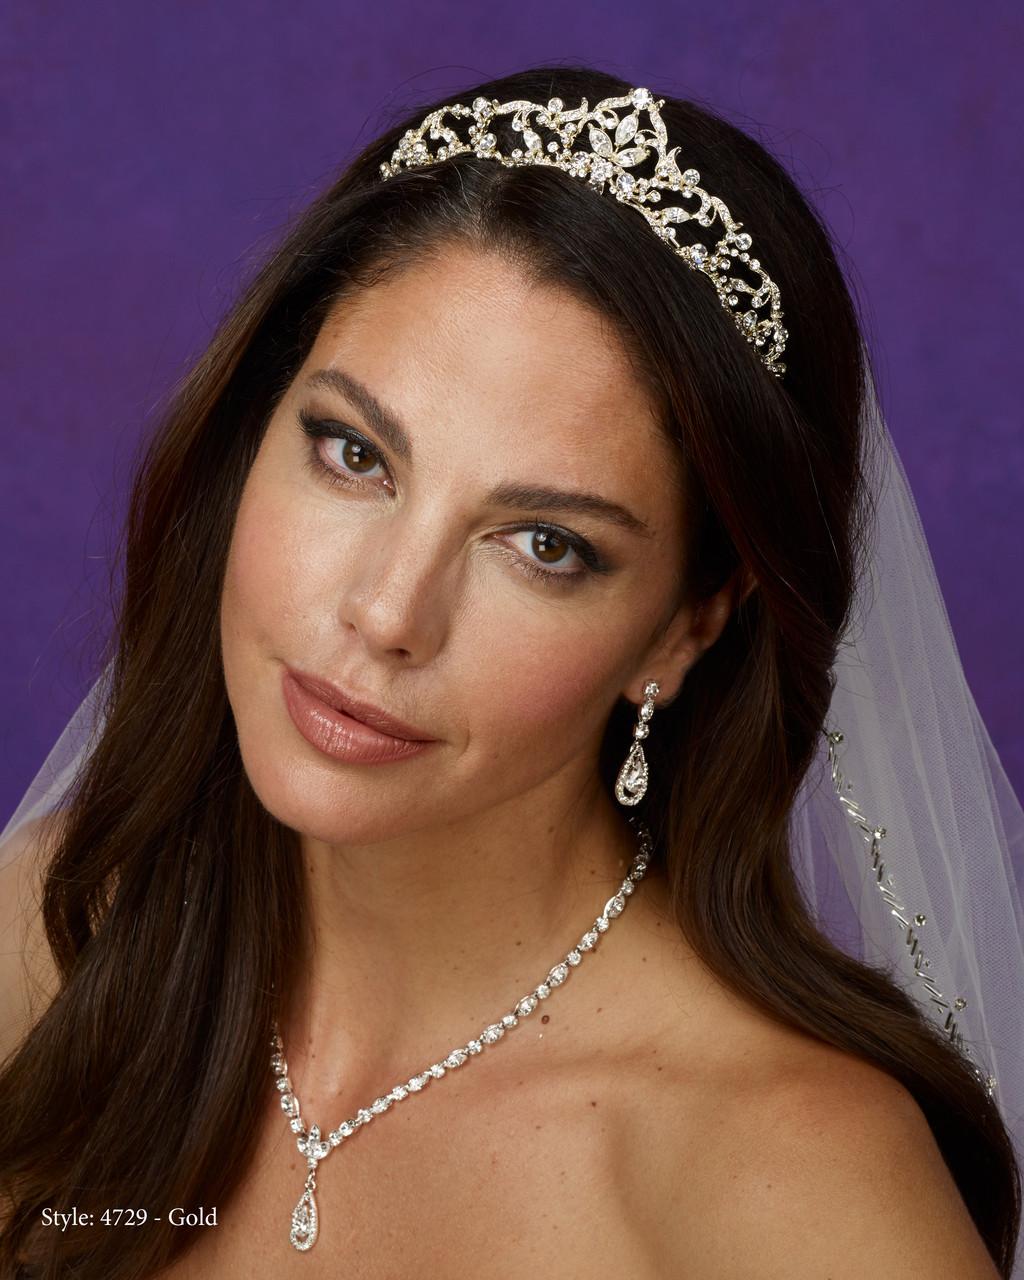 Marionat Bridal 4729 Gold rhinestone tiara - Le Crystal Collection